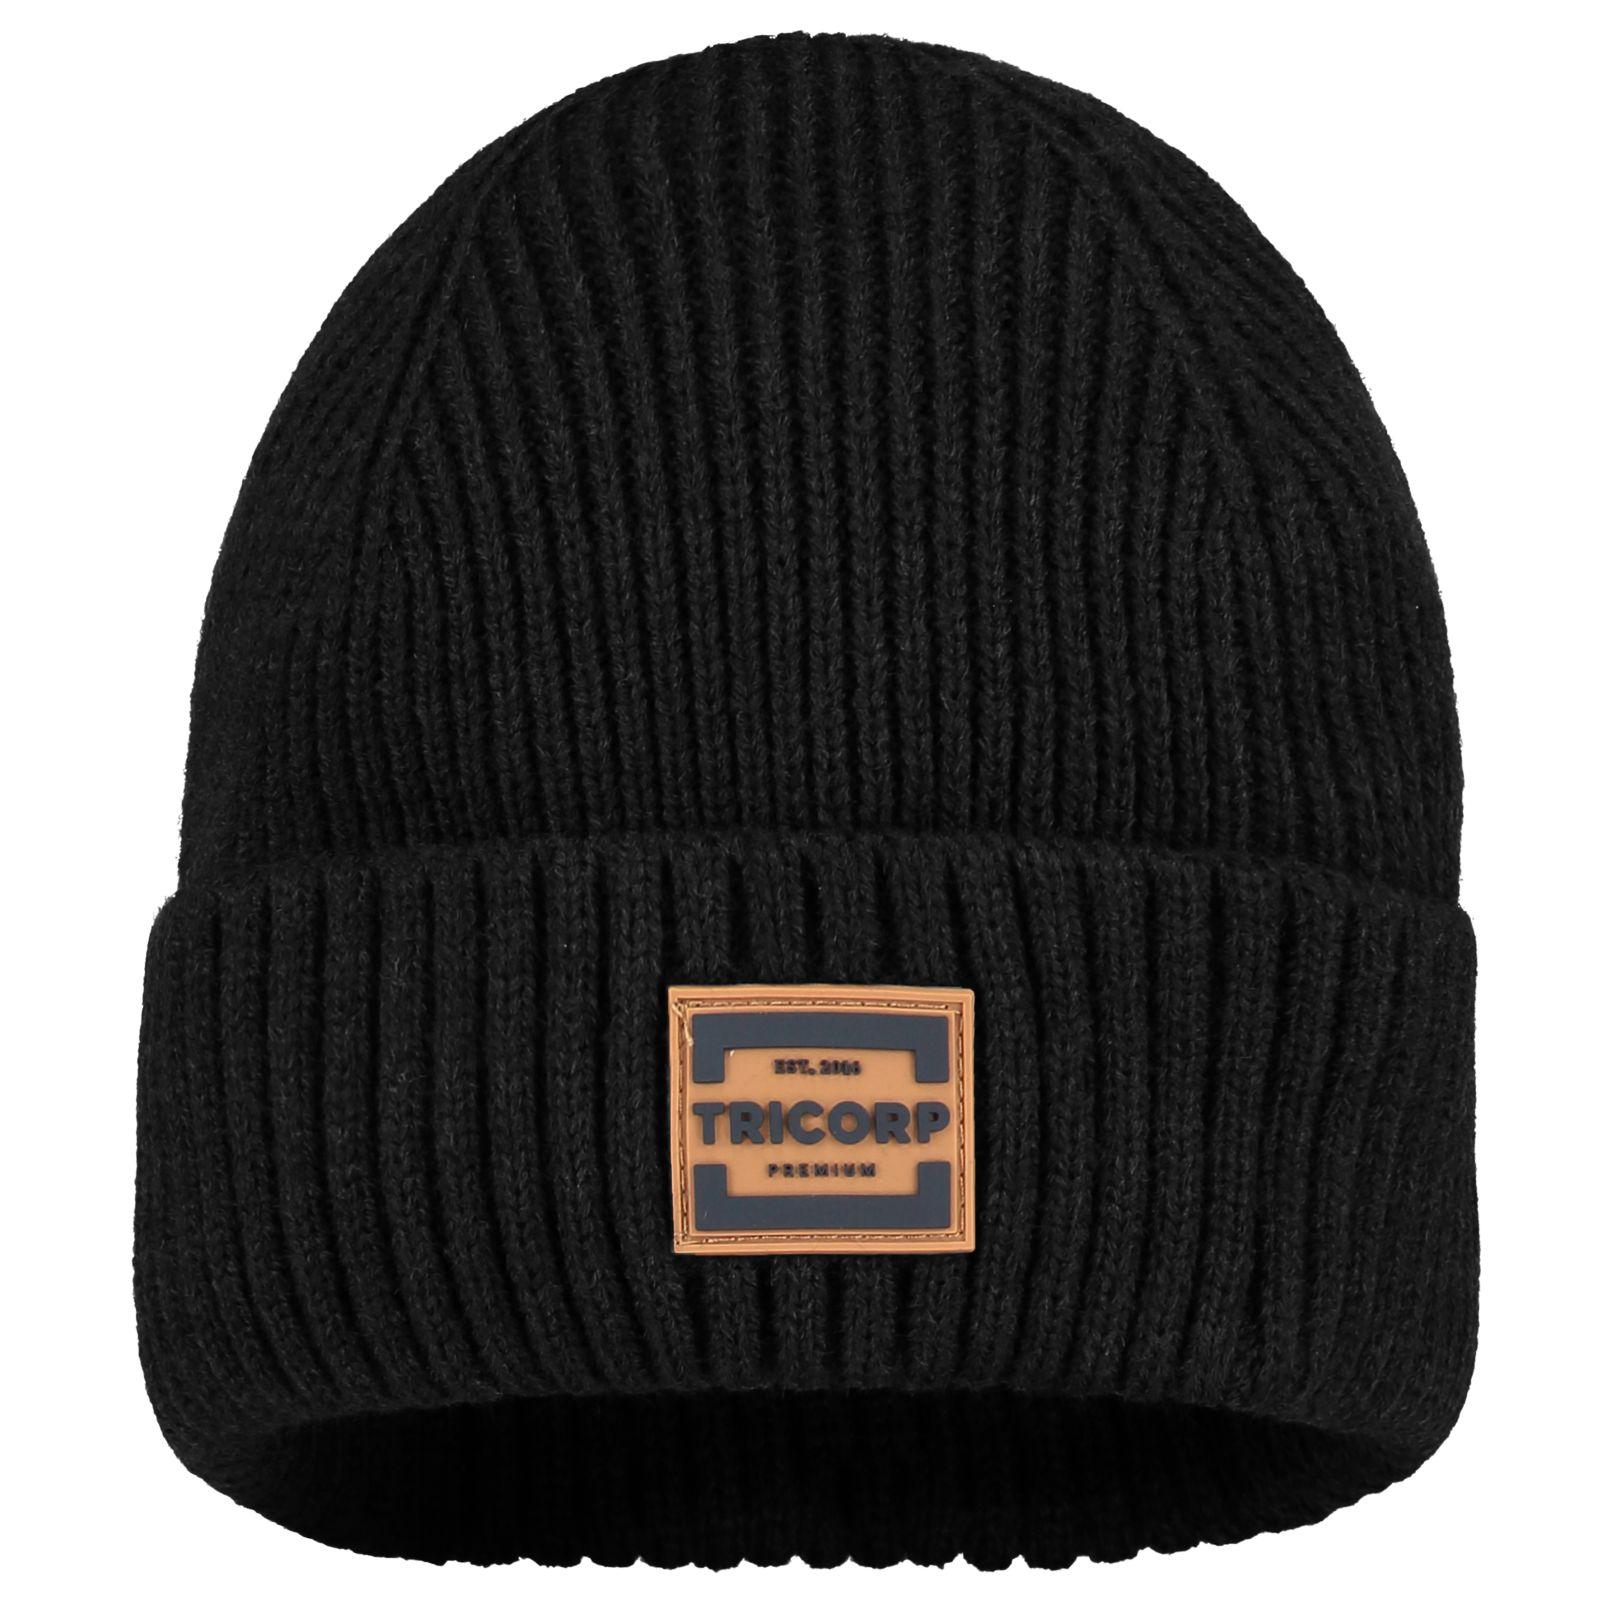 Tricorp Premium Mutsen 654002 Gebreid Acryl zwart(Black)